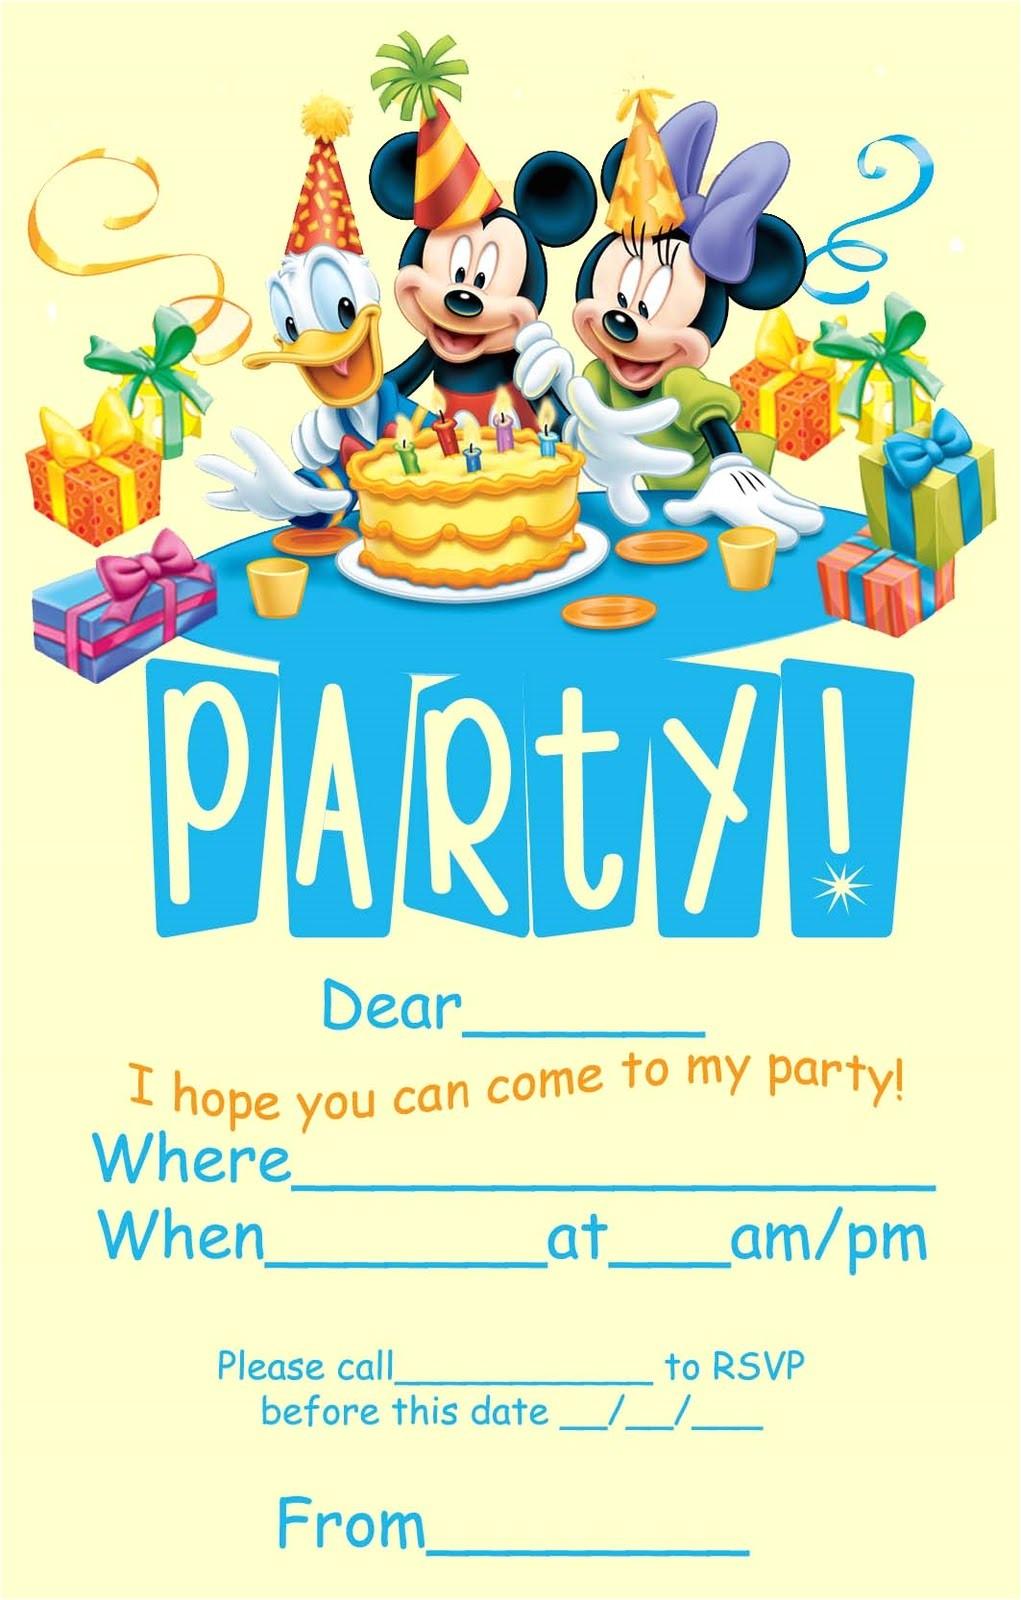 Disney themed Party Invitations Best Disney Birthday Invitations Modern Designs